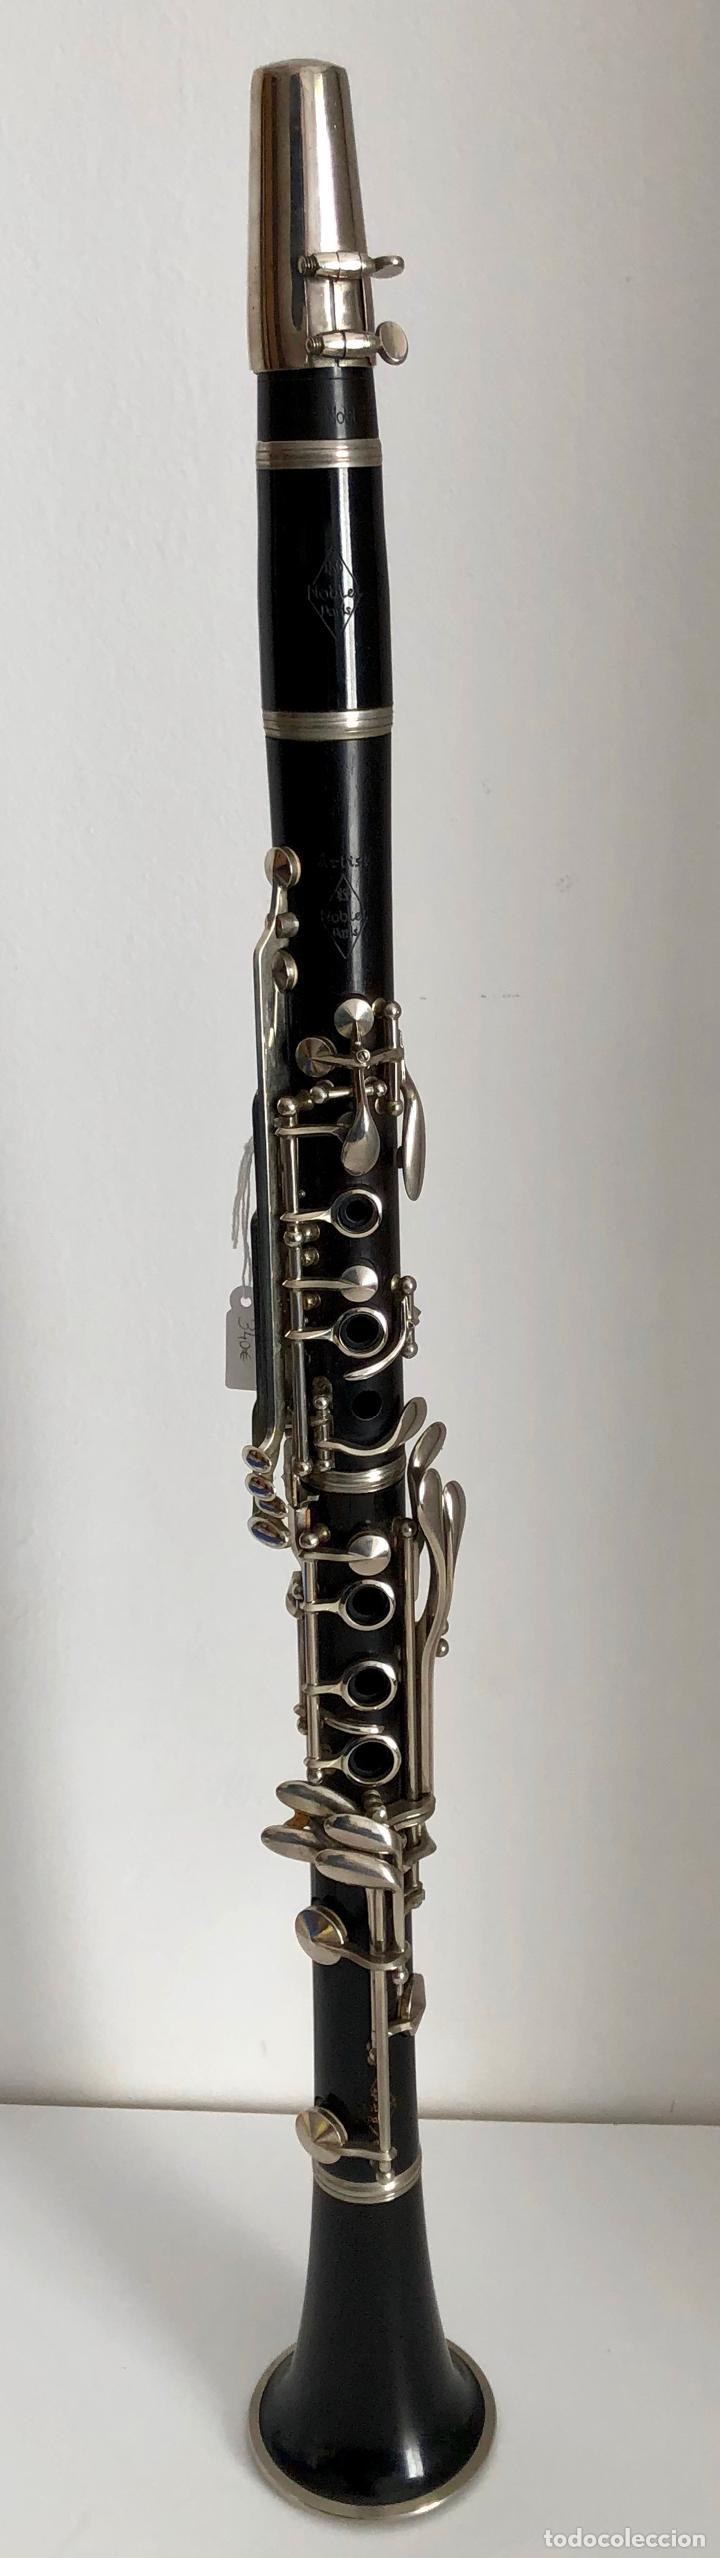 Instrumentos musicales: CLARINETE NOBLET PARIS - Foto 6 - 194878962